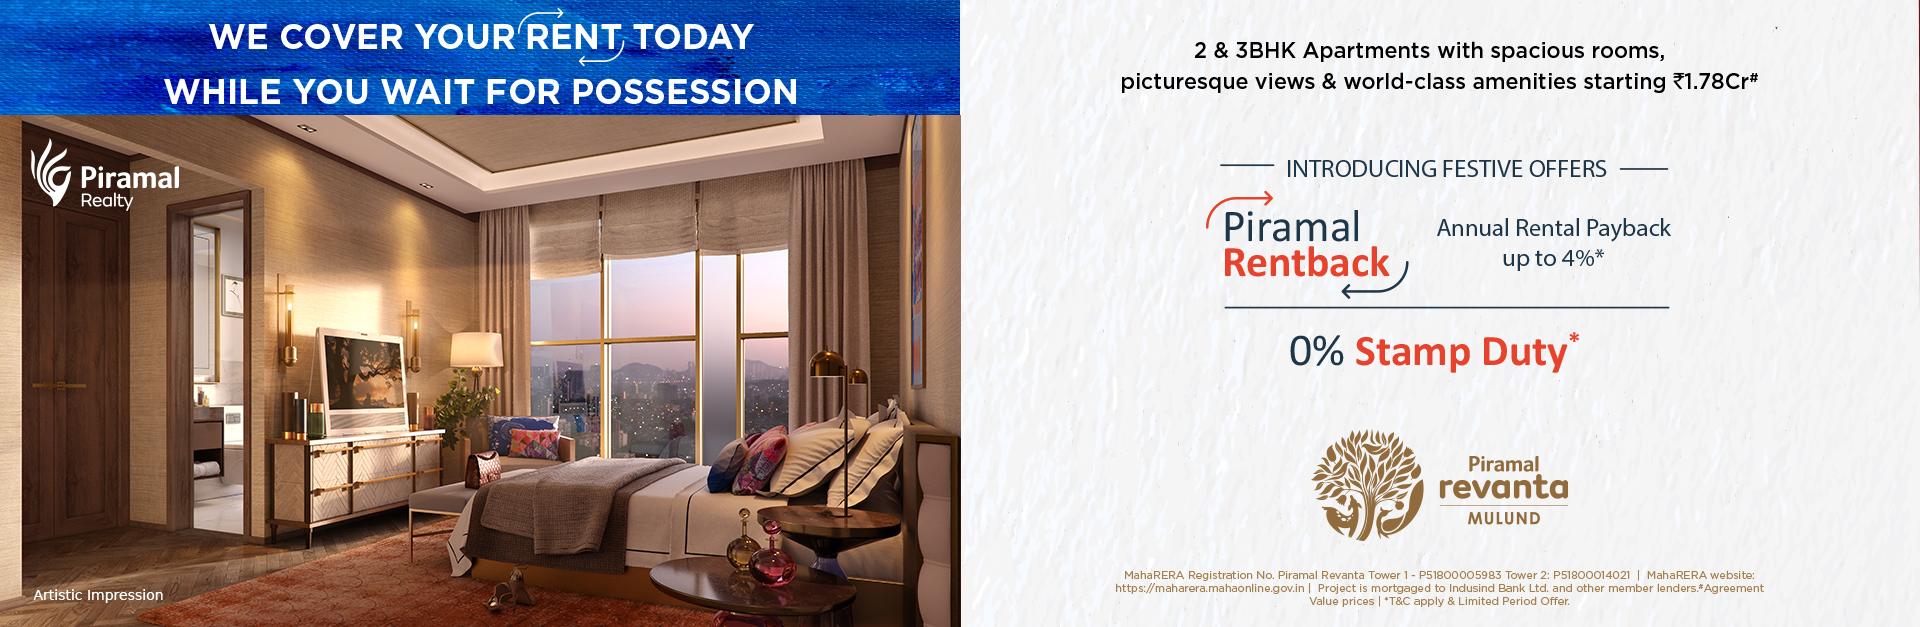 Piramal Revanta - Luxury Apartments in Mulund